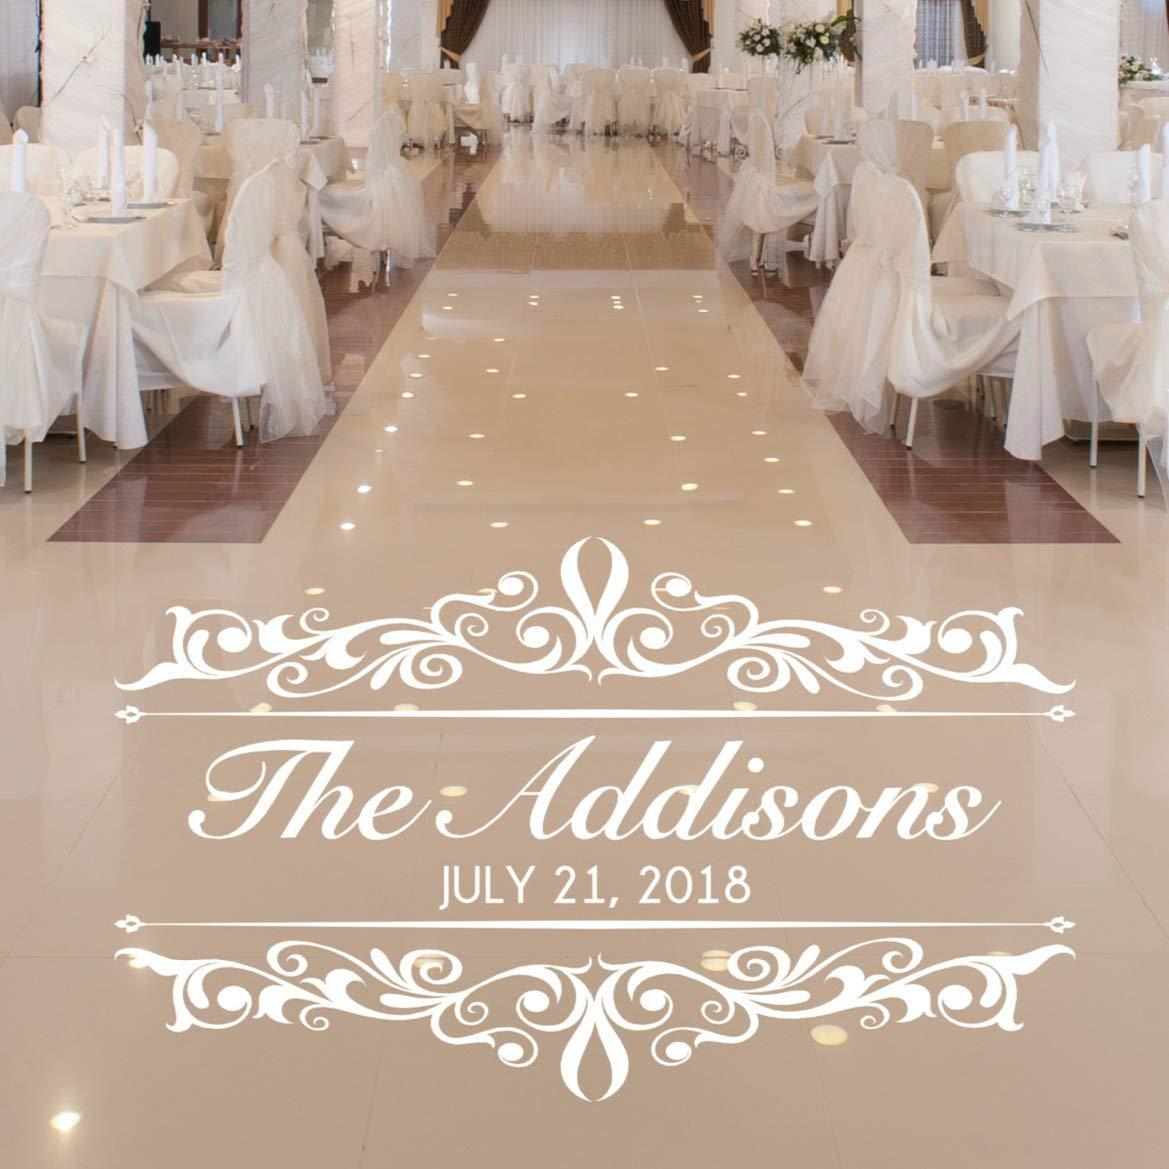 Vintage Wedding Decorations.Vinylwritten Vintage Wedding Decorations Dance Floor Decal Personalized Damask Wall Decor 30 Colors Several Sizes